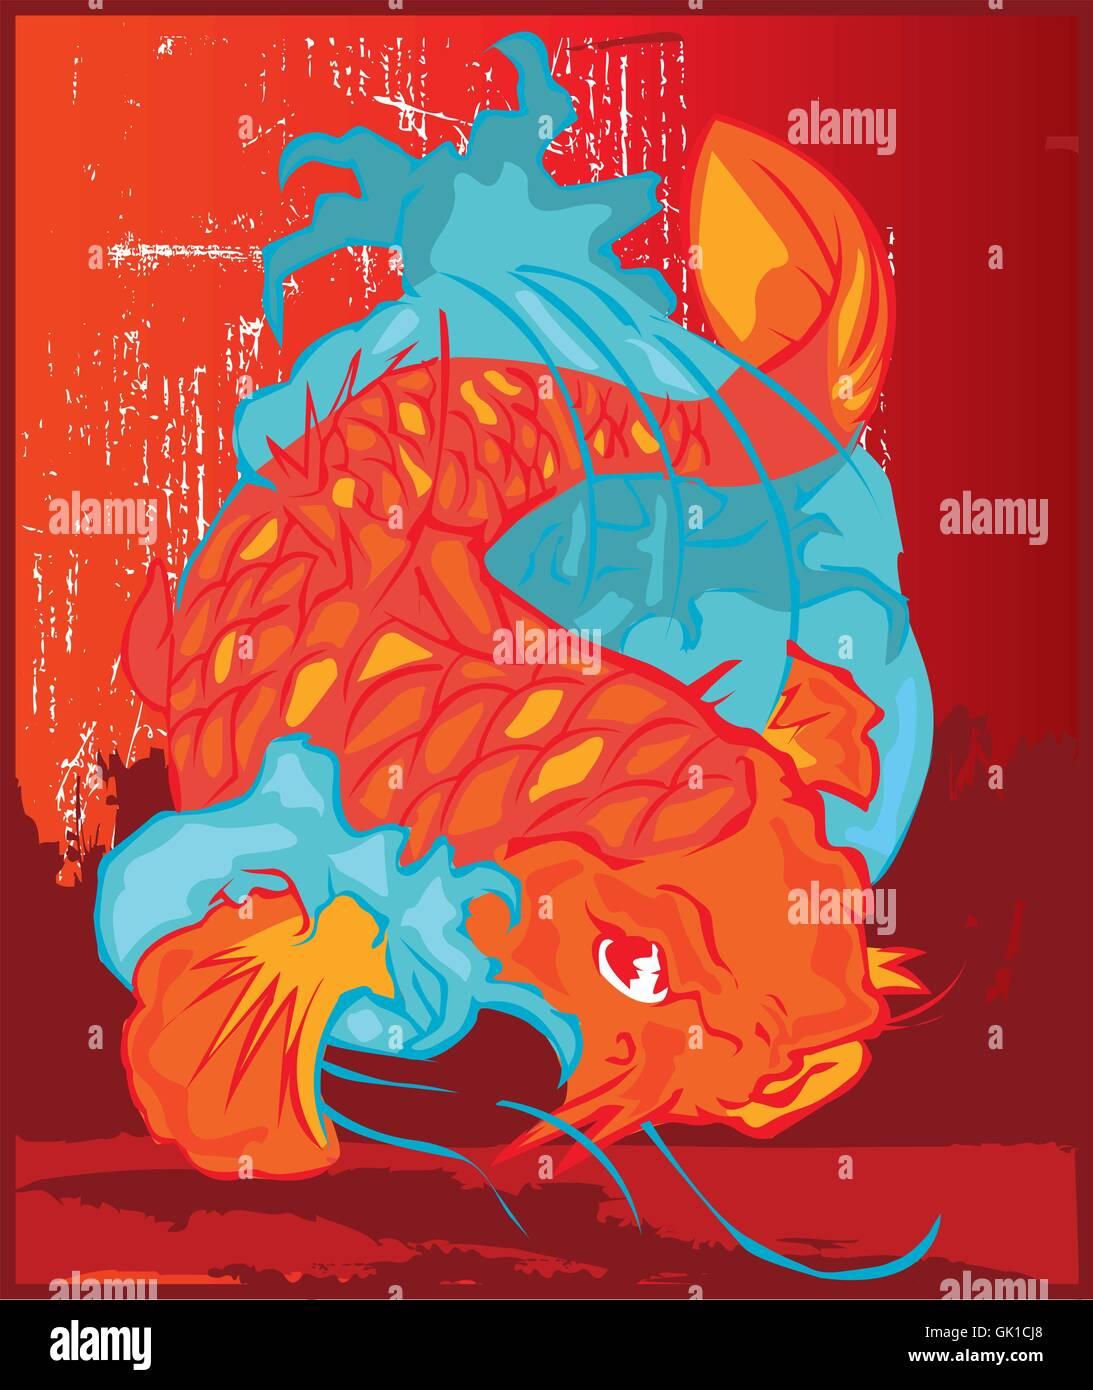 Koi Fish Stock Vector Art & Illustration, Vector Image: 114972544 ...